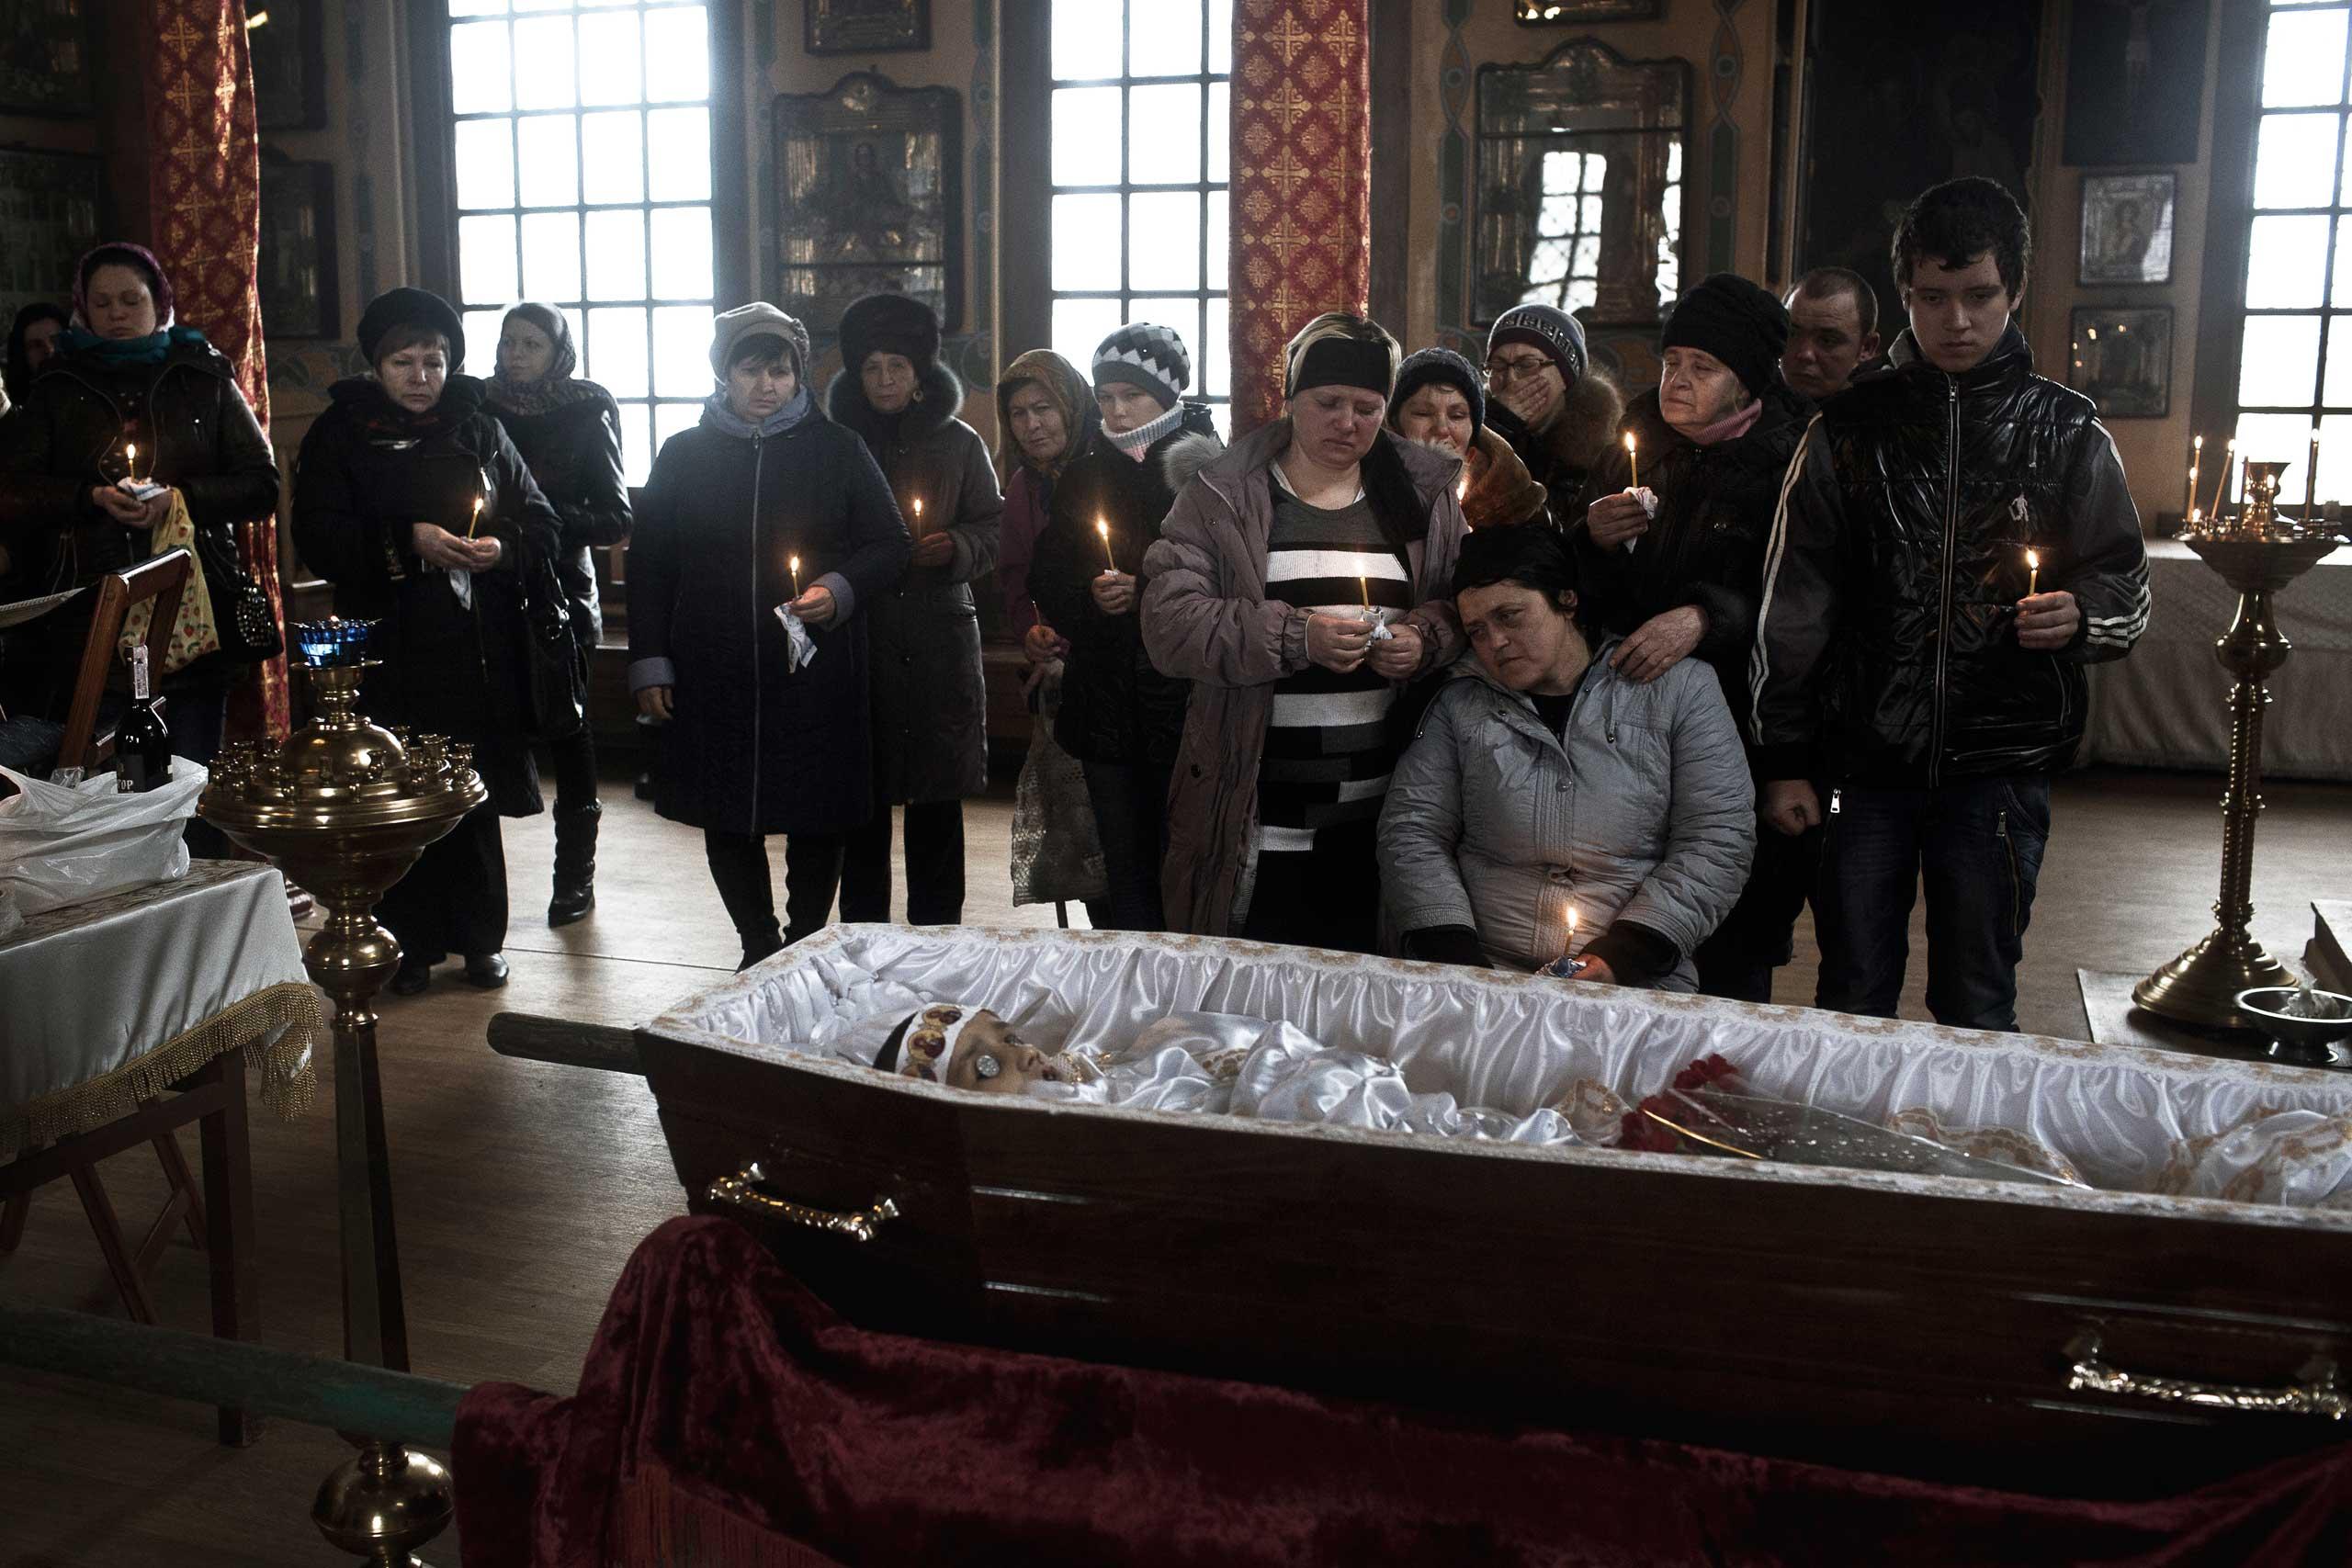 Funeral of seven-year-old Igor Molodetskykh, killed in a shelling by separatist rebels, is held in Artemivsk, Ukraine, Feb. 15, 2015.